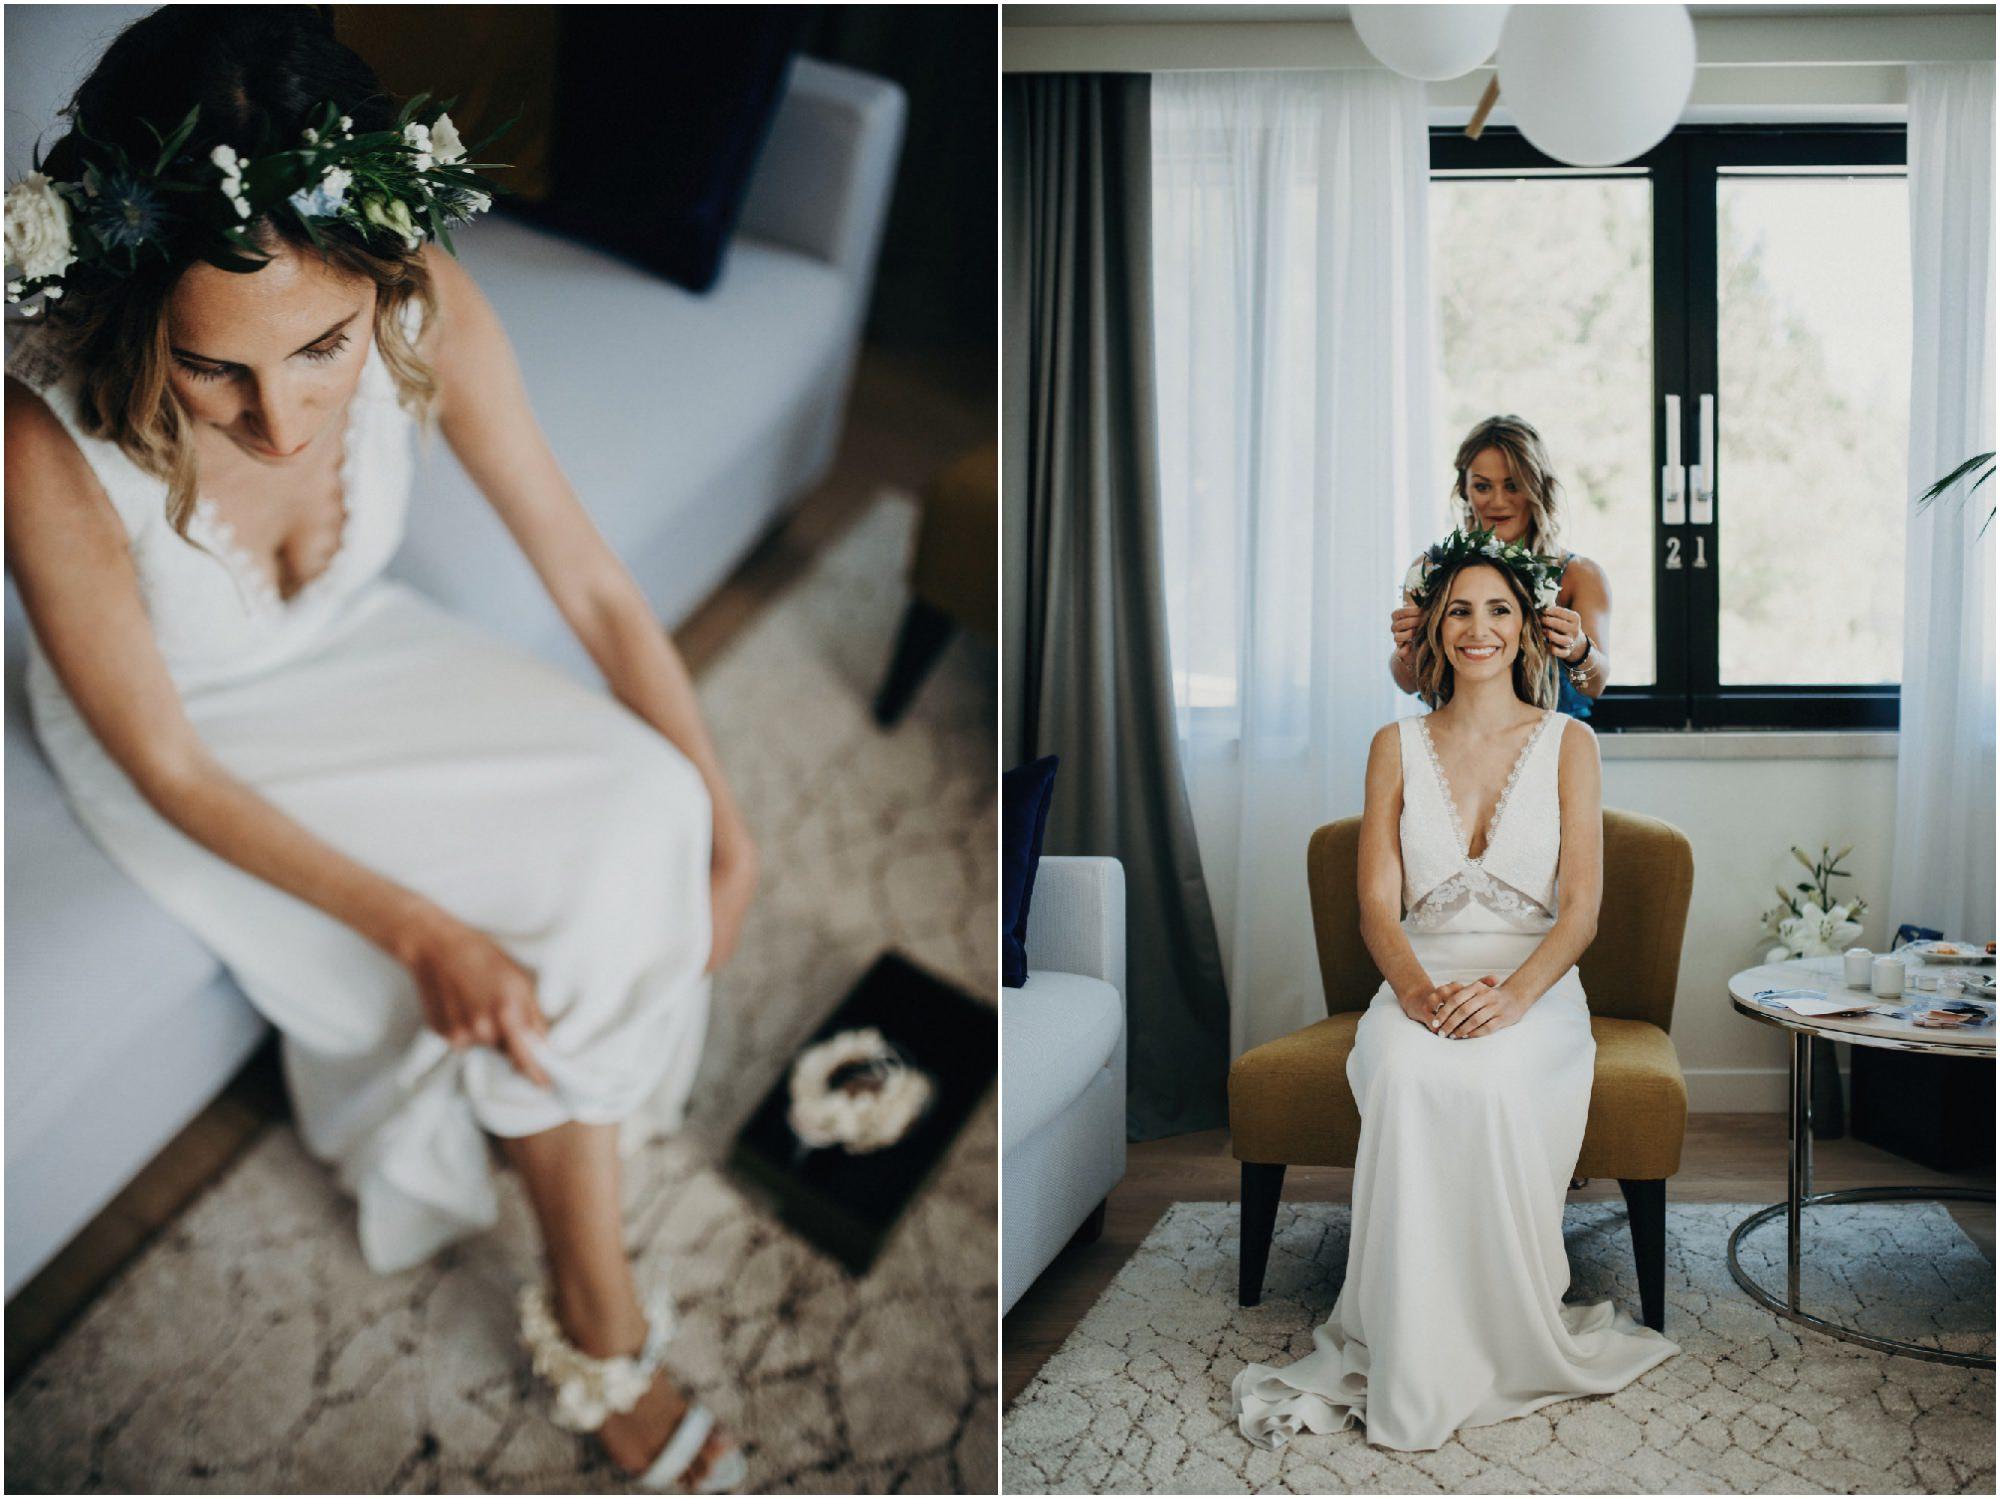 dubrovnik_croatia_wedding_photographer-jere_satamo-destination_weddings-034-web.jpg